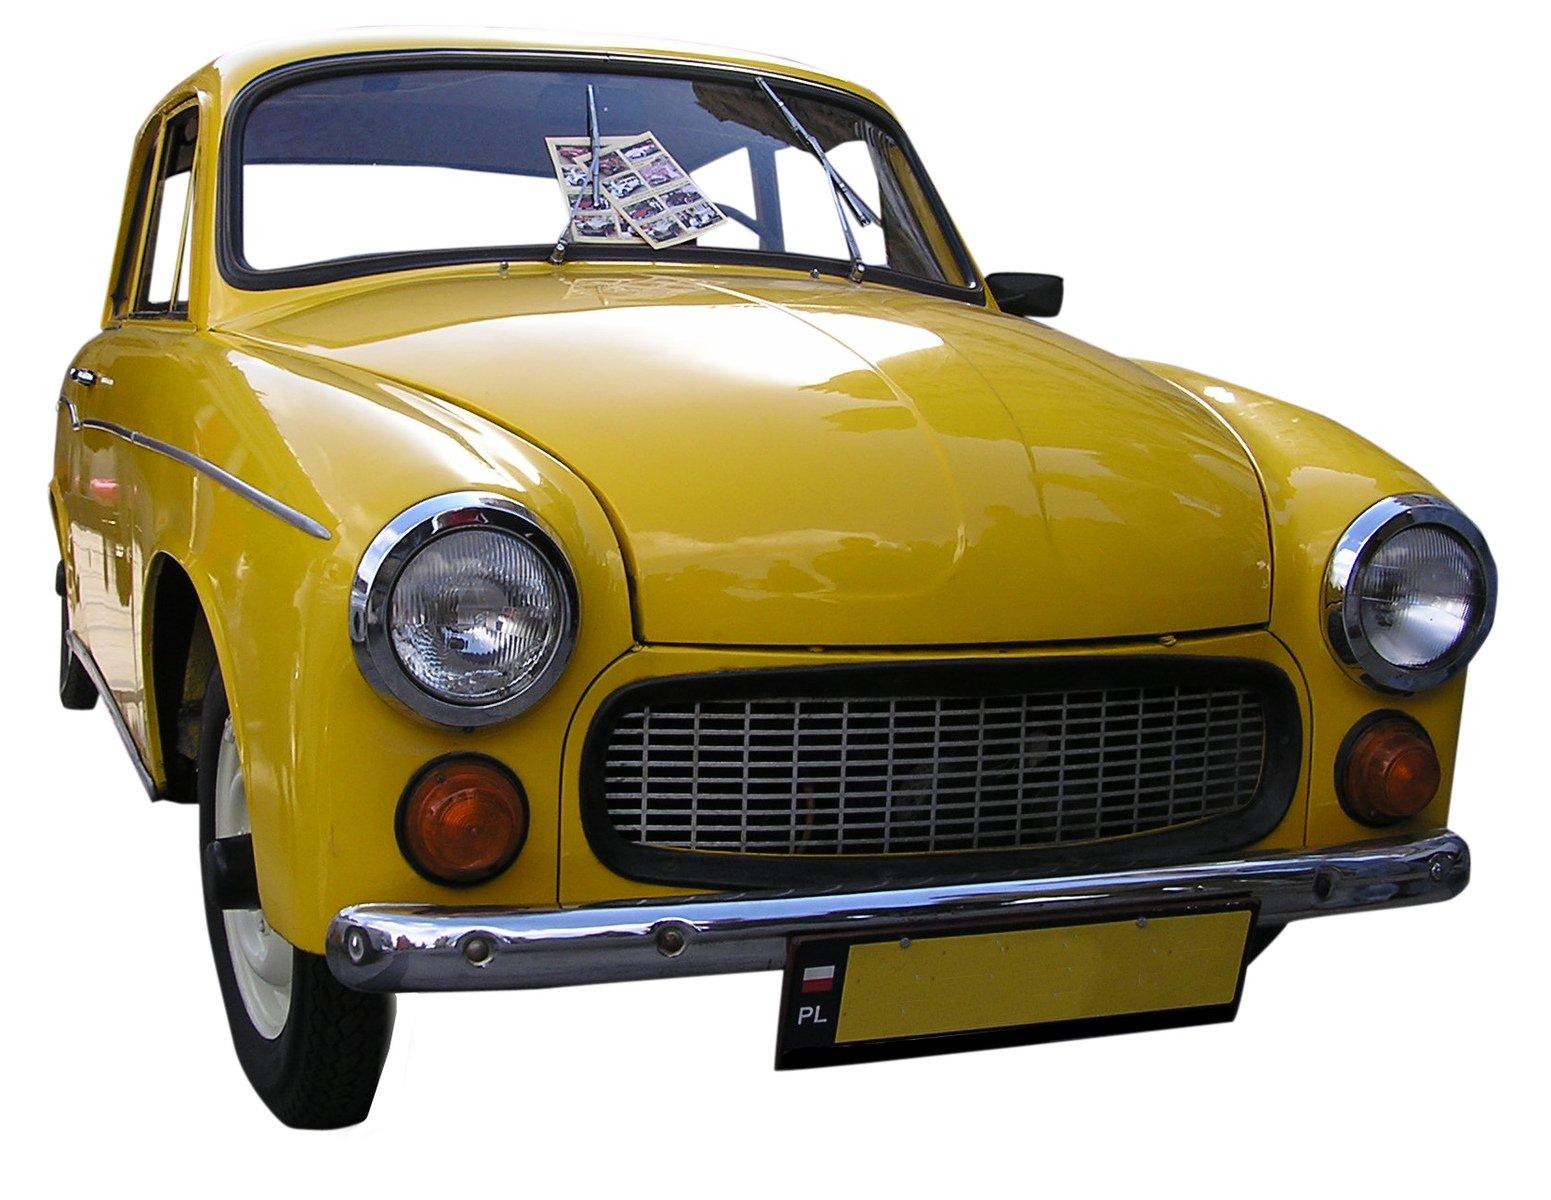 free old polish car stock photo. Black Bedroom Furniture Sets. Home Design Ideas